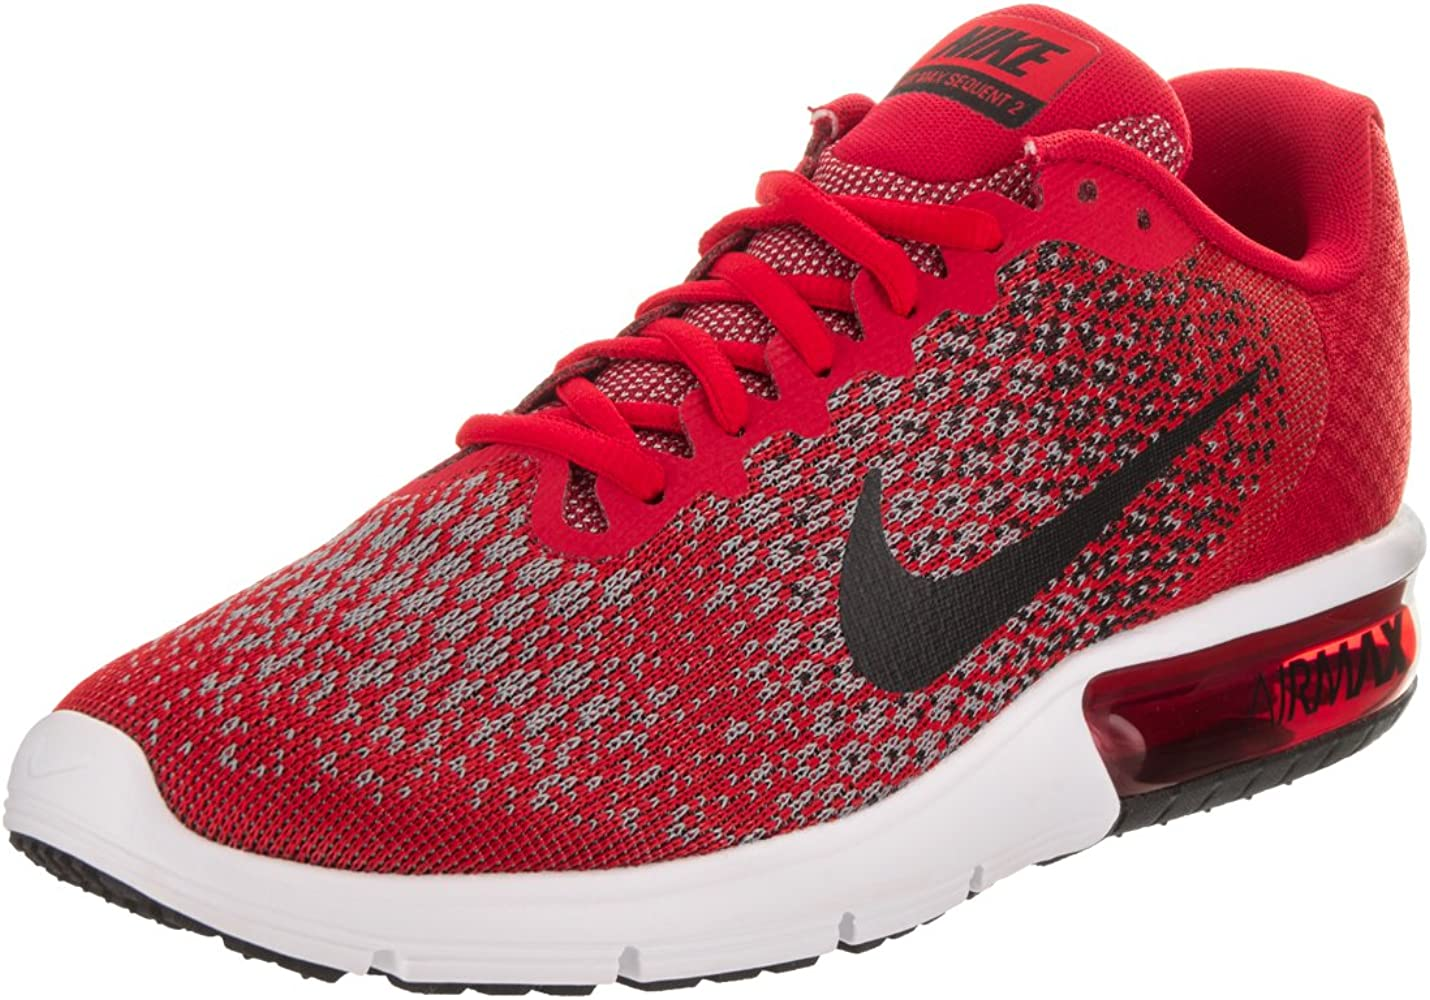 fd18a2161b25d Men's Air Max Sequent 2 Running Shoes (12 D(M) US, University  Red/Black/Cool Grey/Black)